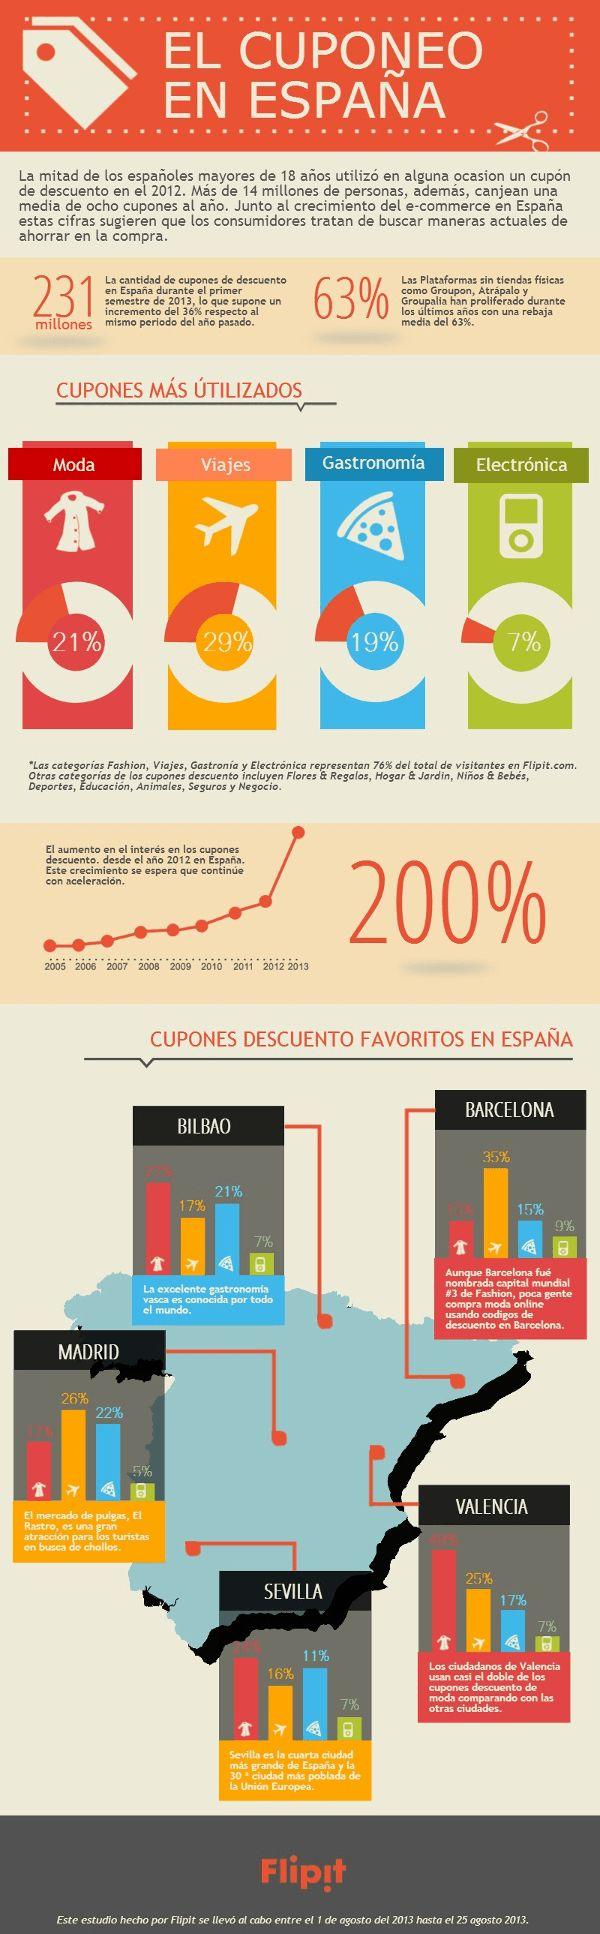 Cupones en España #infografia #infographic #marketing